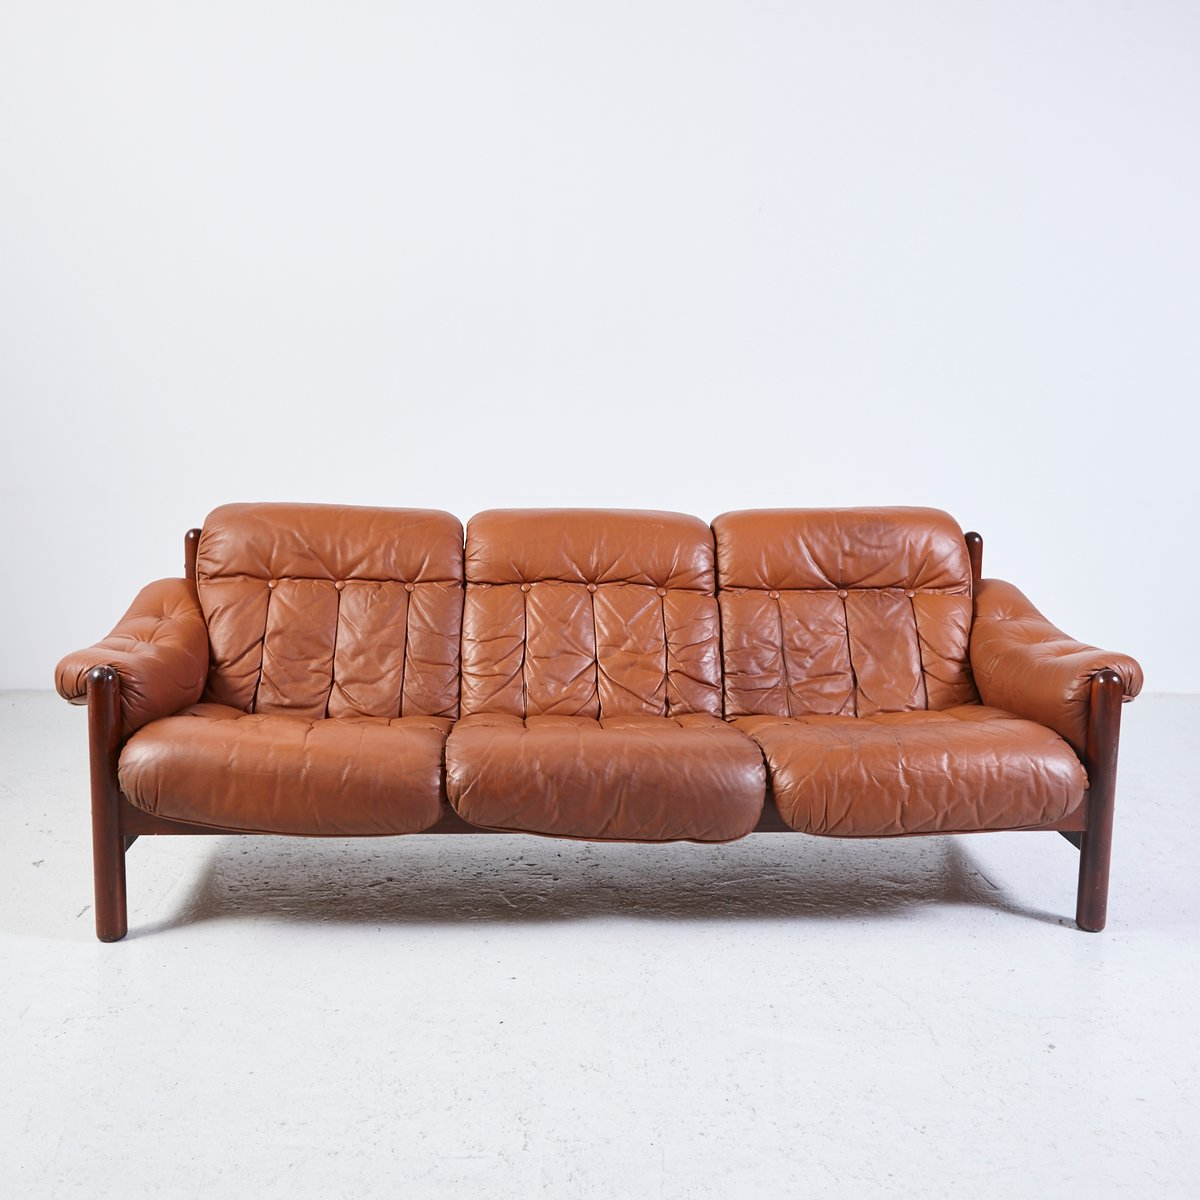 Vintage 3-Sitzer Ledersofa mit Teak Gestell